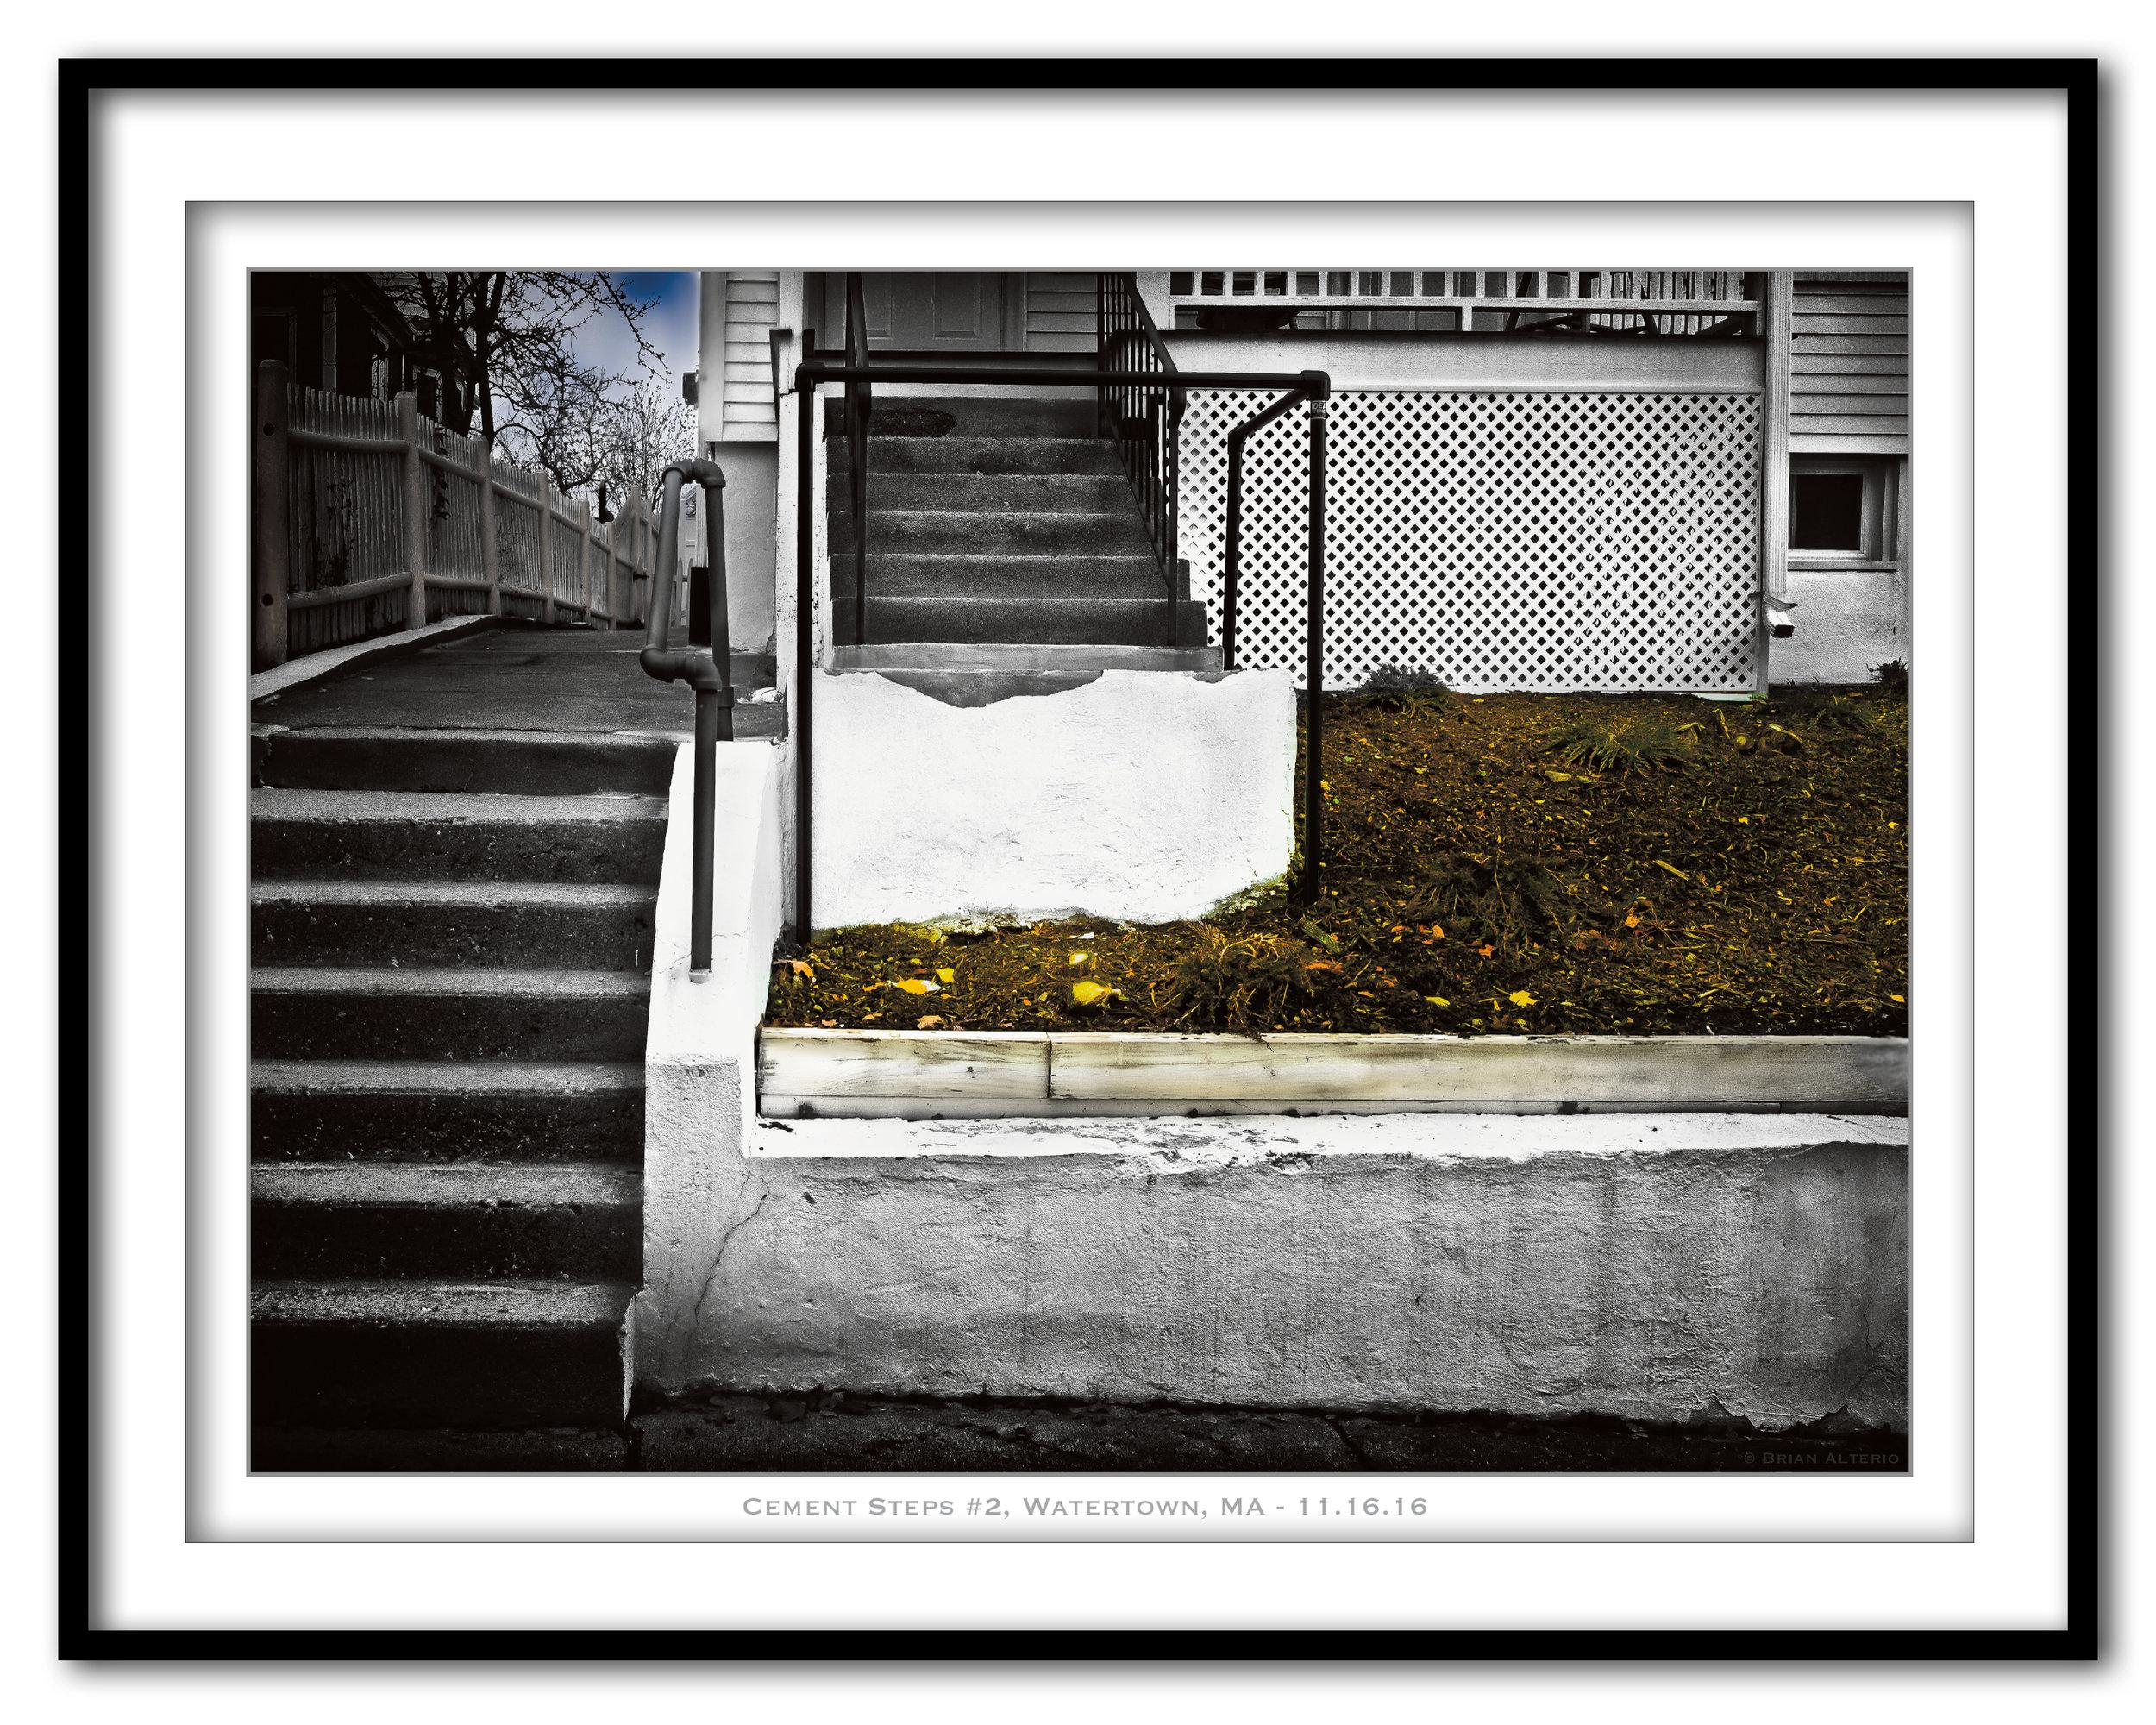 Cement Steps #2, Watertown, MA - 11.16.16 - Framed.jpg